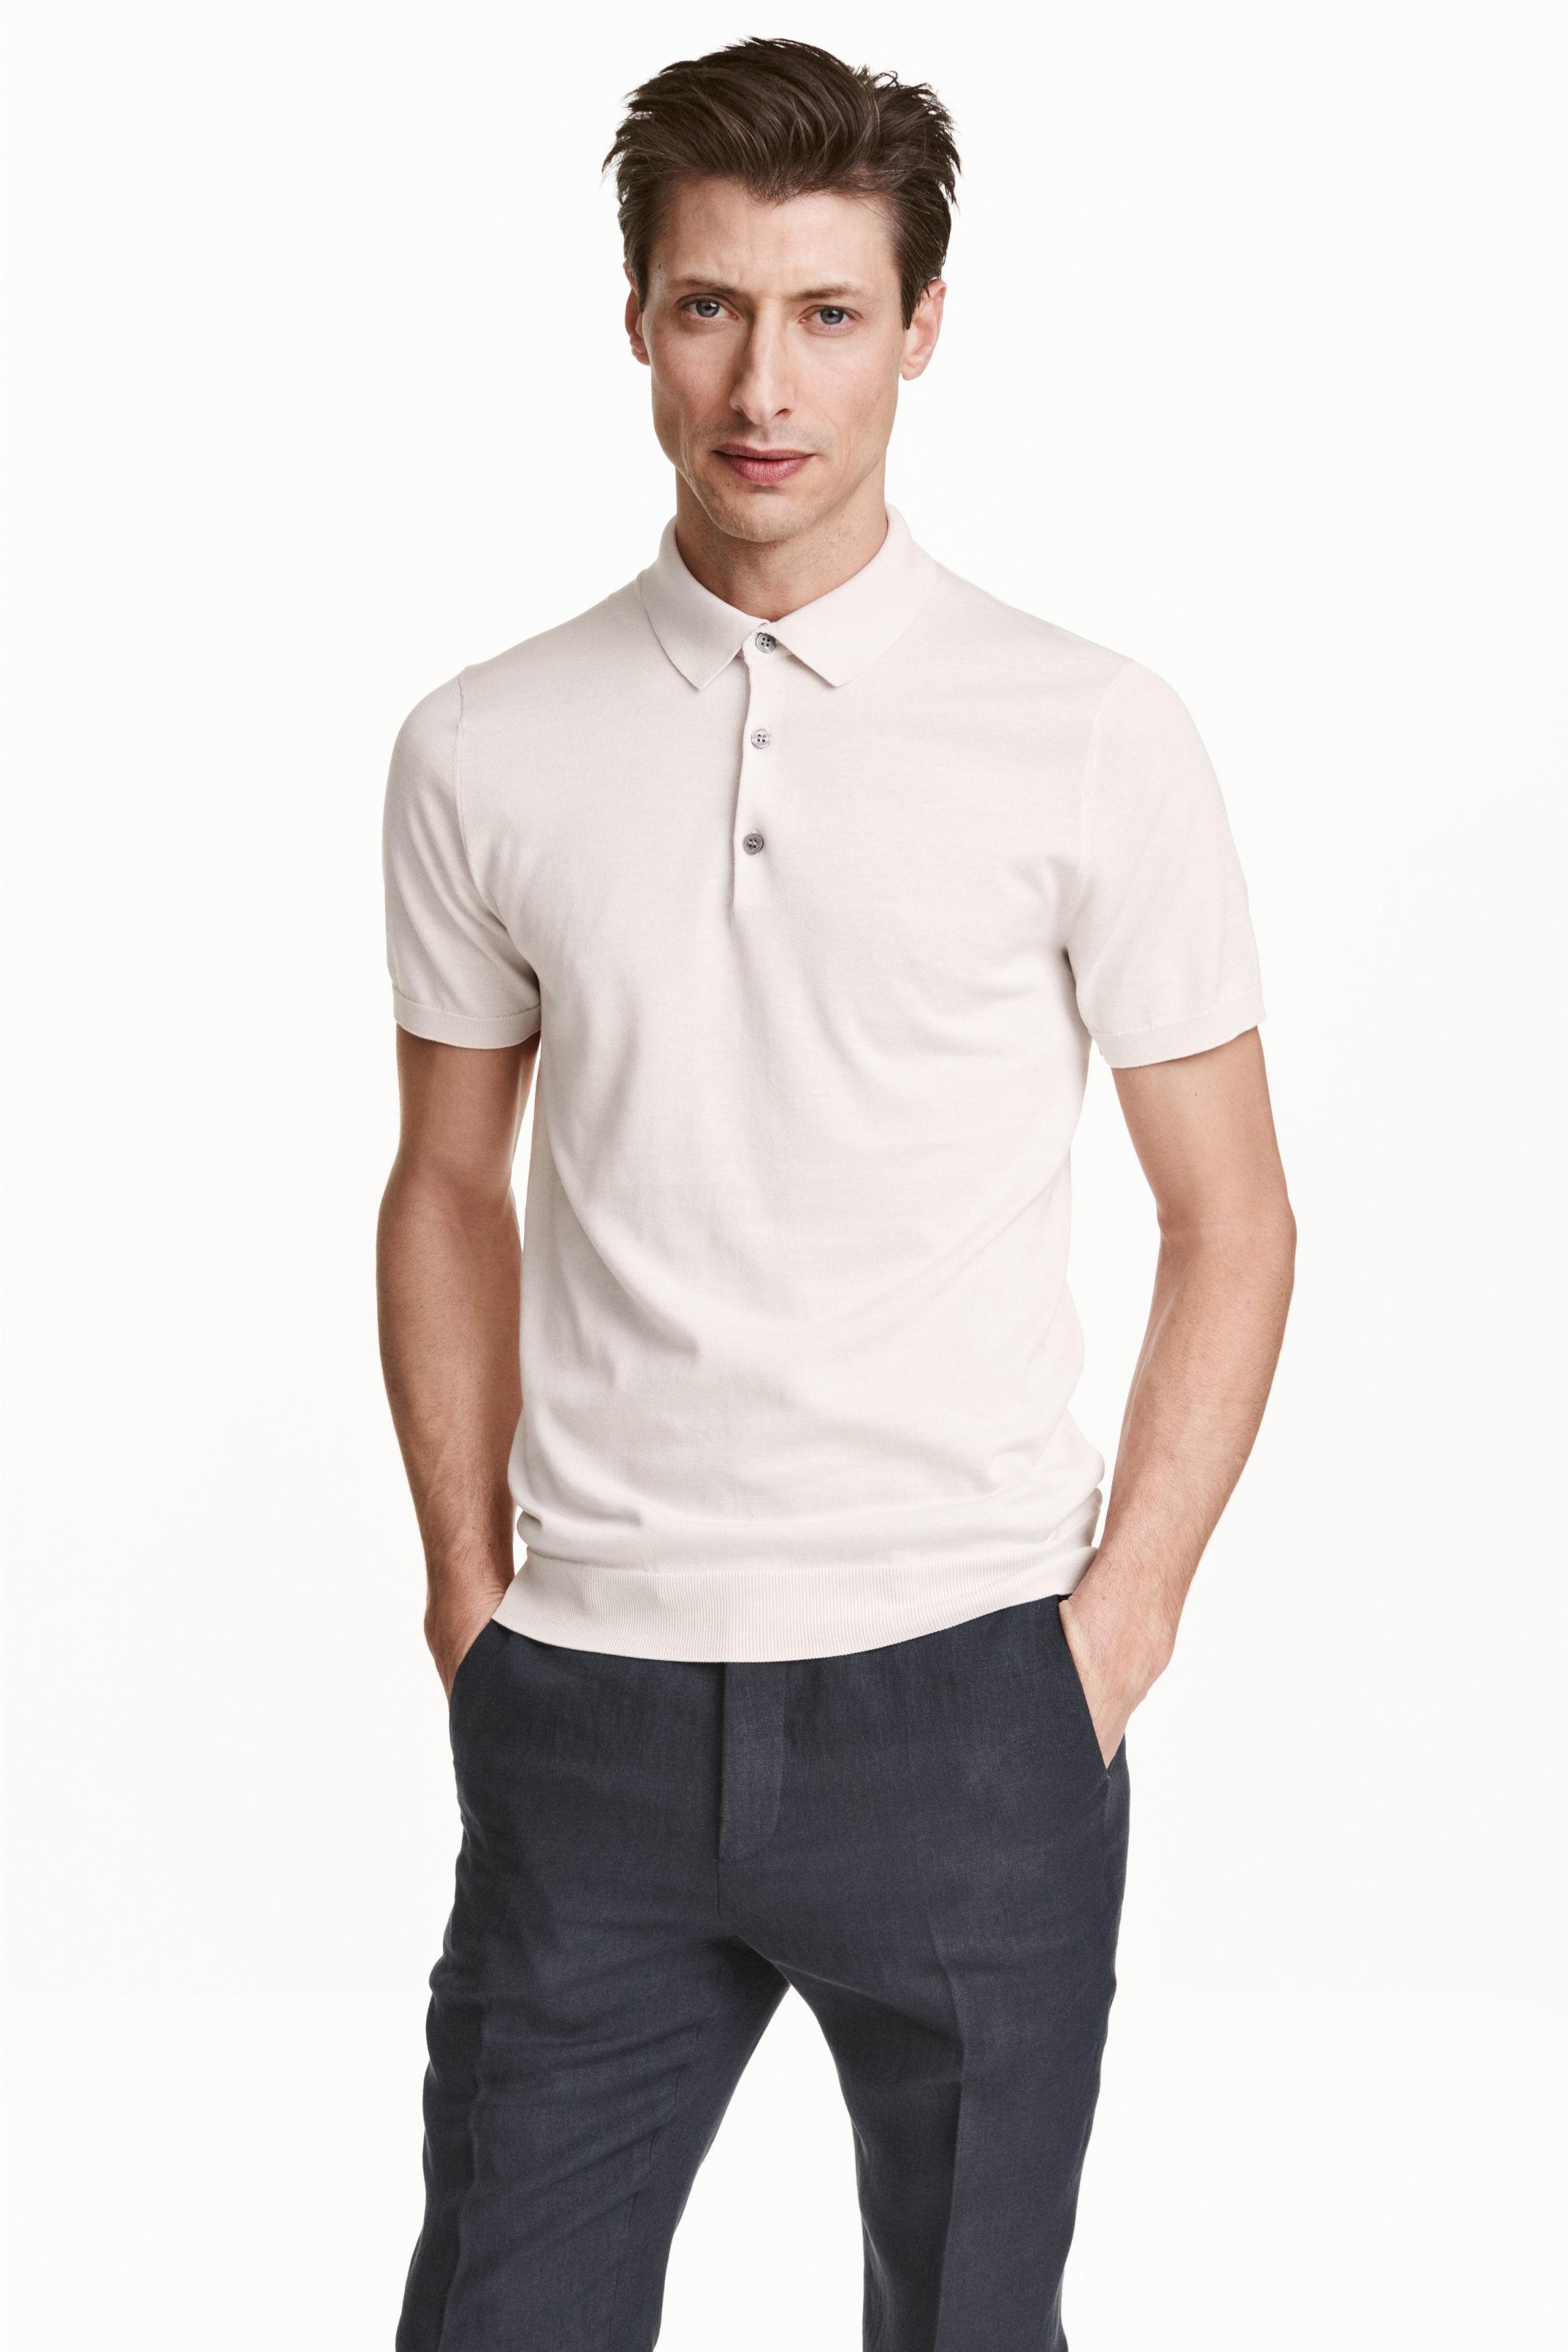 H m silk blend polo shirt in white for men lyst for H m polo shirt mens